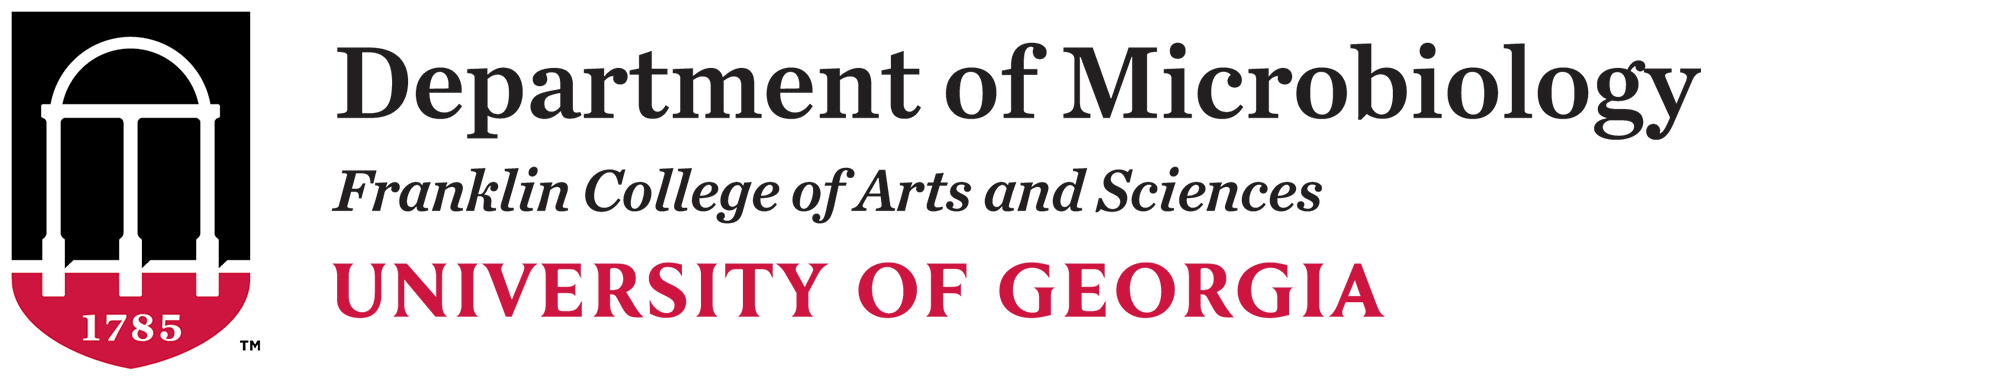 Graduate Program Handbook Department Of Microbiology Uga Dissertation Format Check